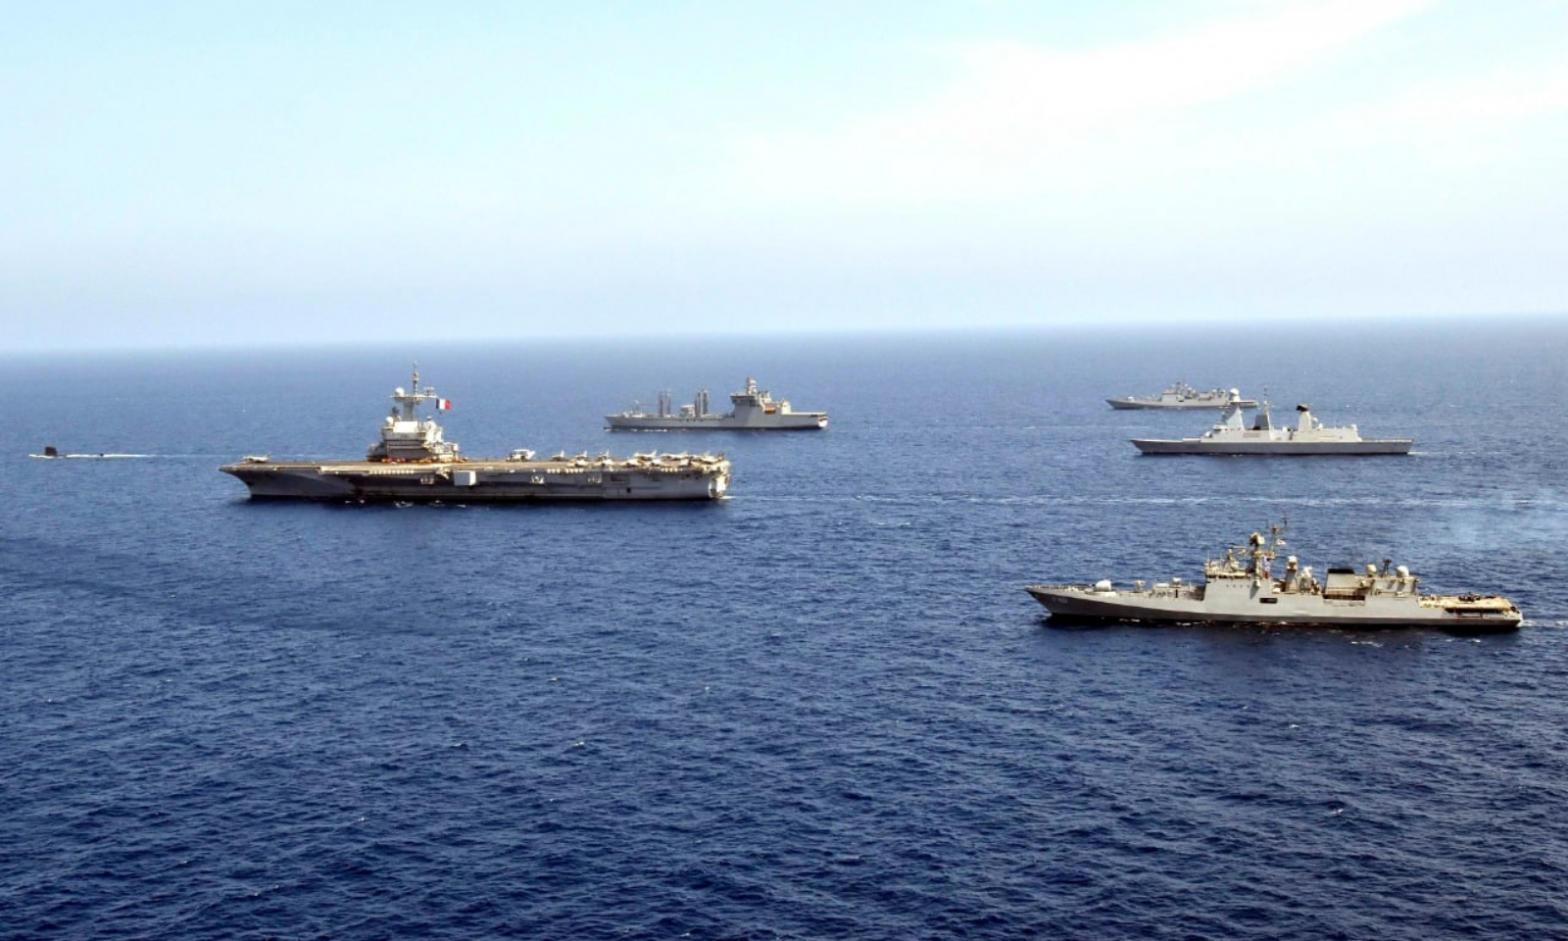 Indian and Indonesian navies conduct exercise in Arabian sea|ভারতীয় ও ইন্দোনেশিয়ান নৌবাহিনী আরব সাগরে মহড়া পরিচালনা করেছে_40.1